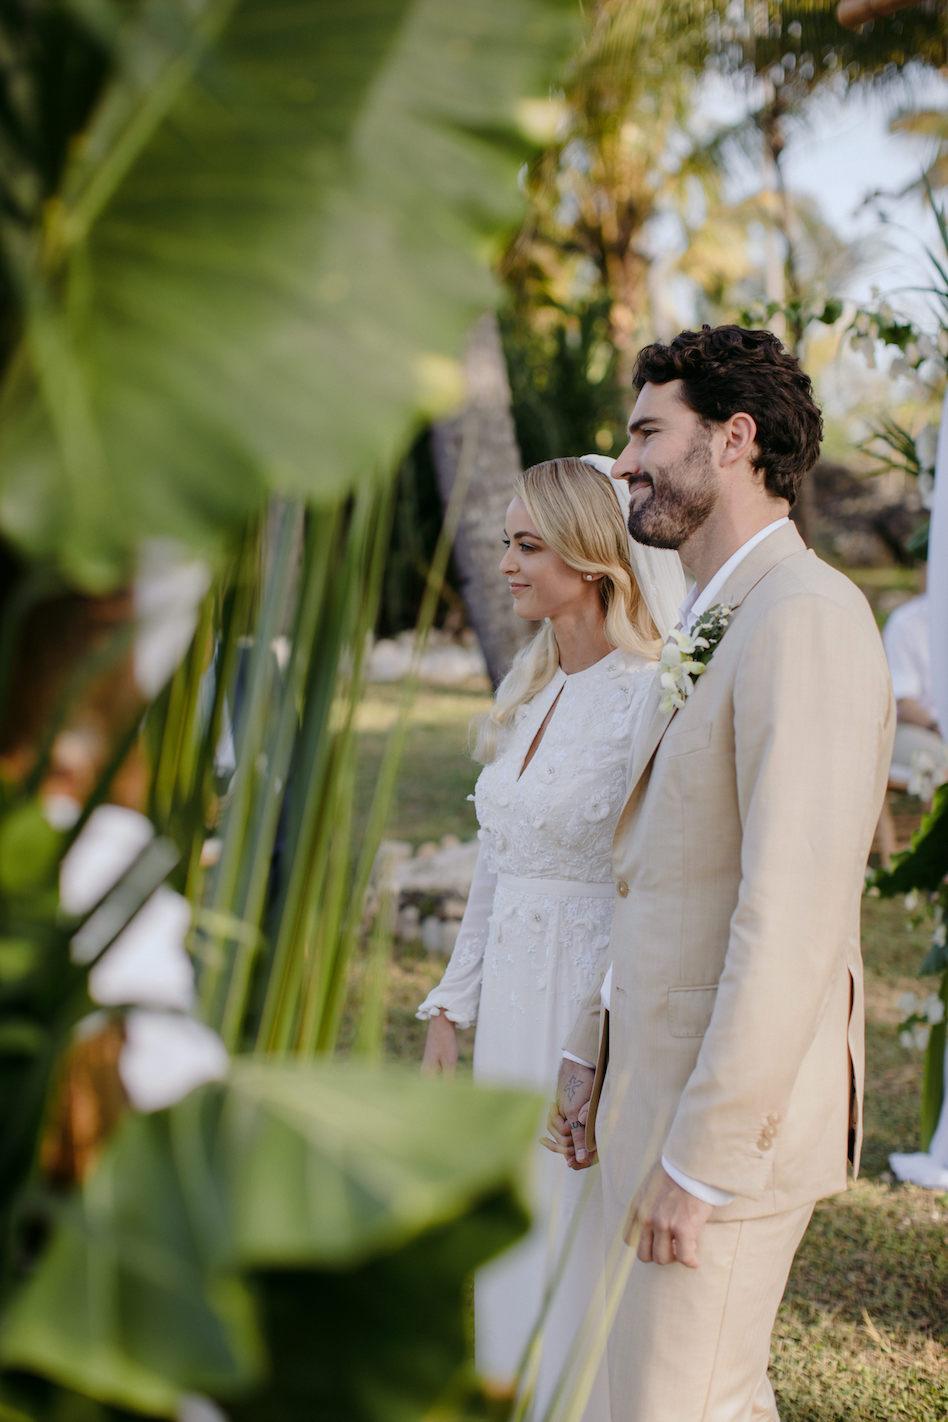 kaitlyn_brody_wedding-559.jpg